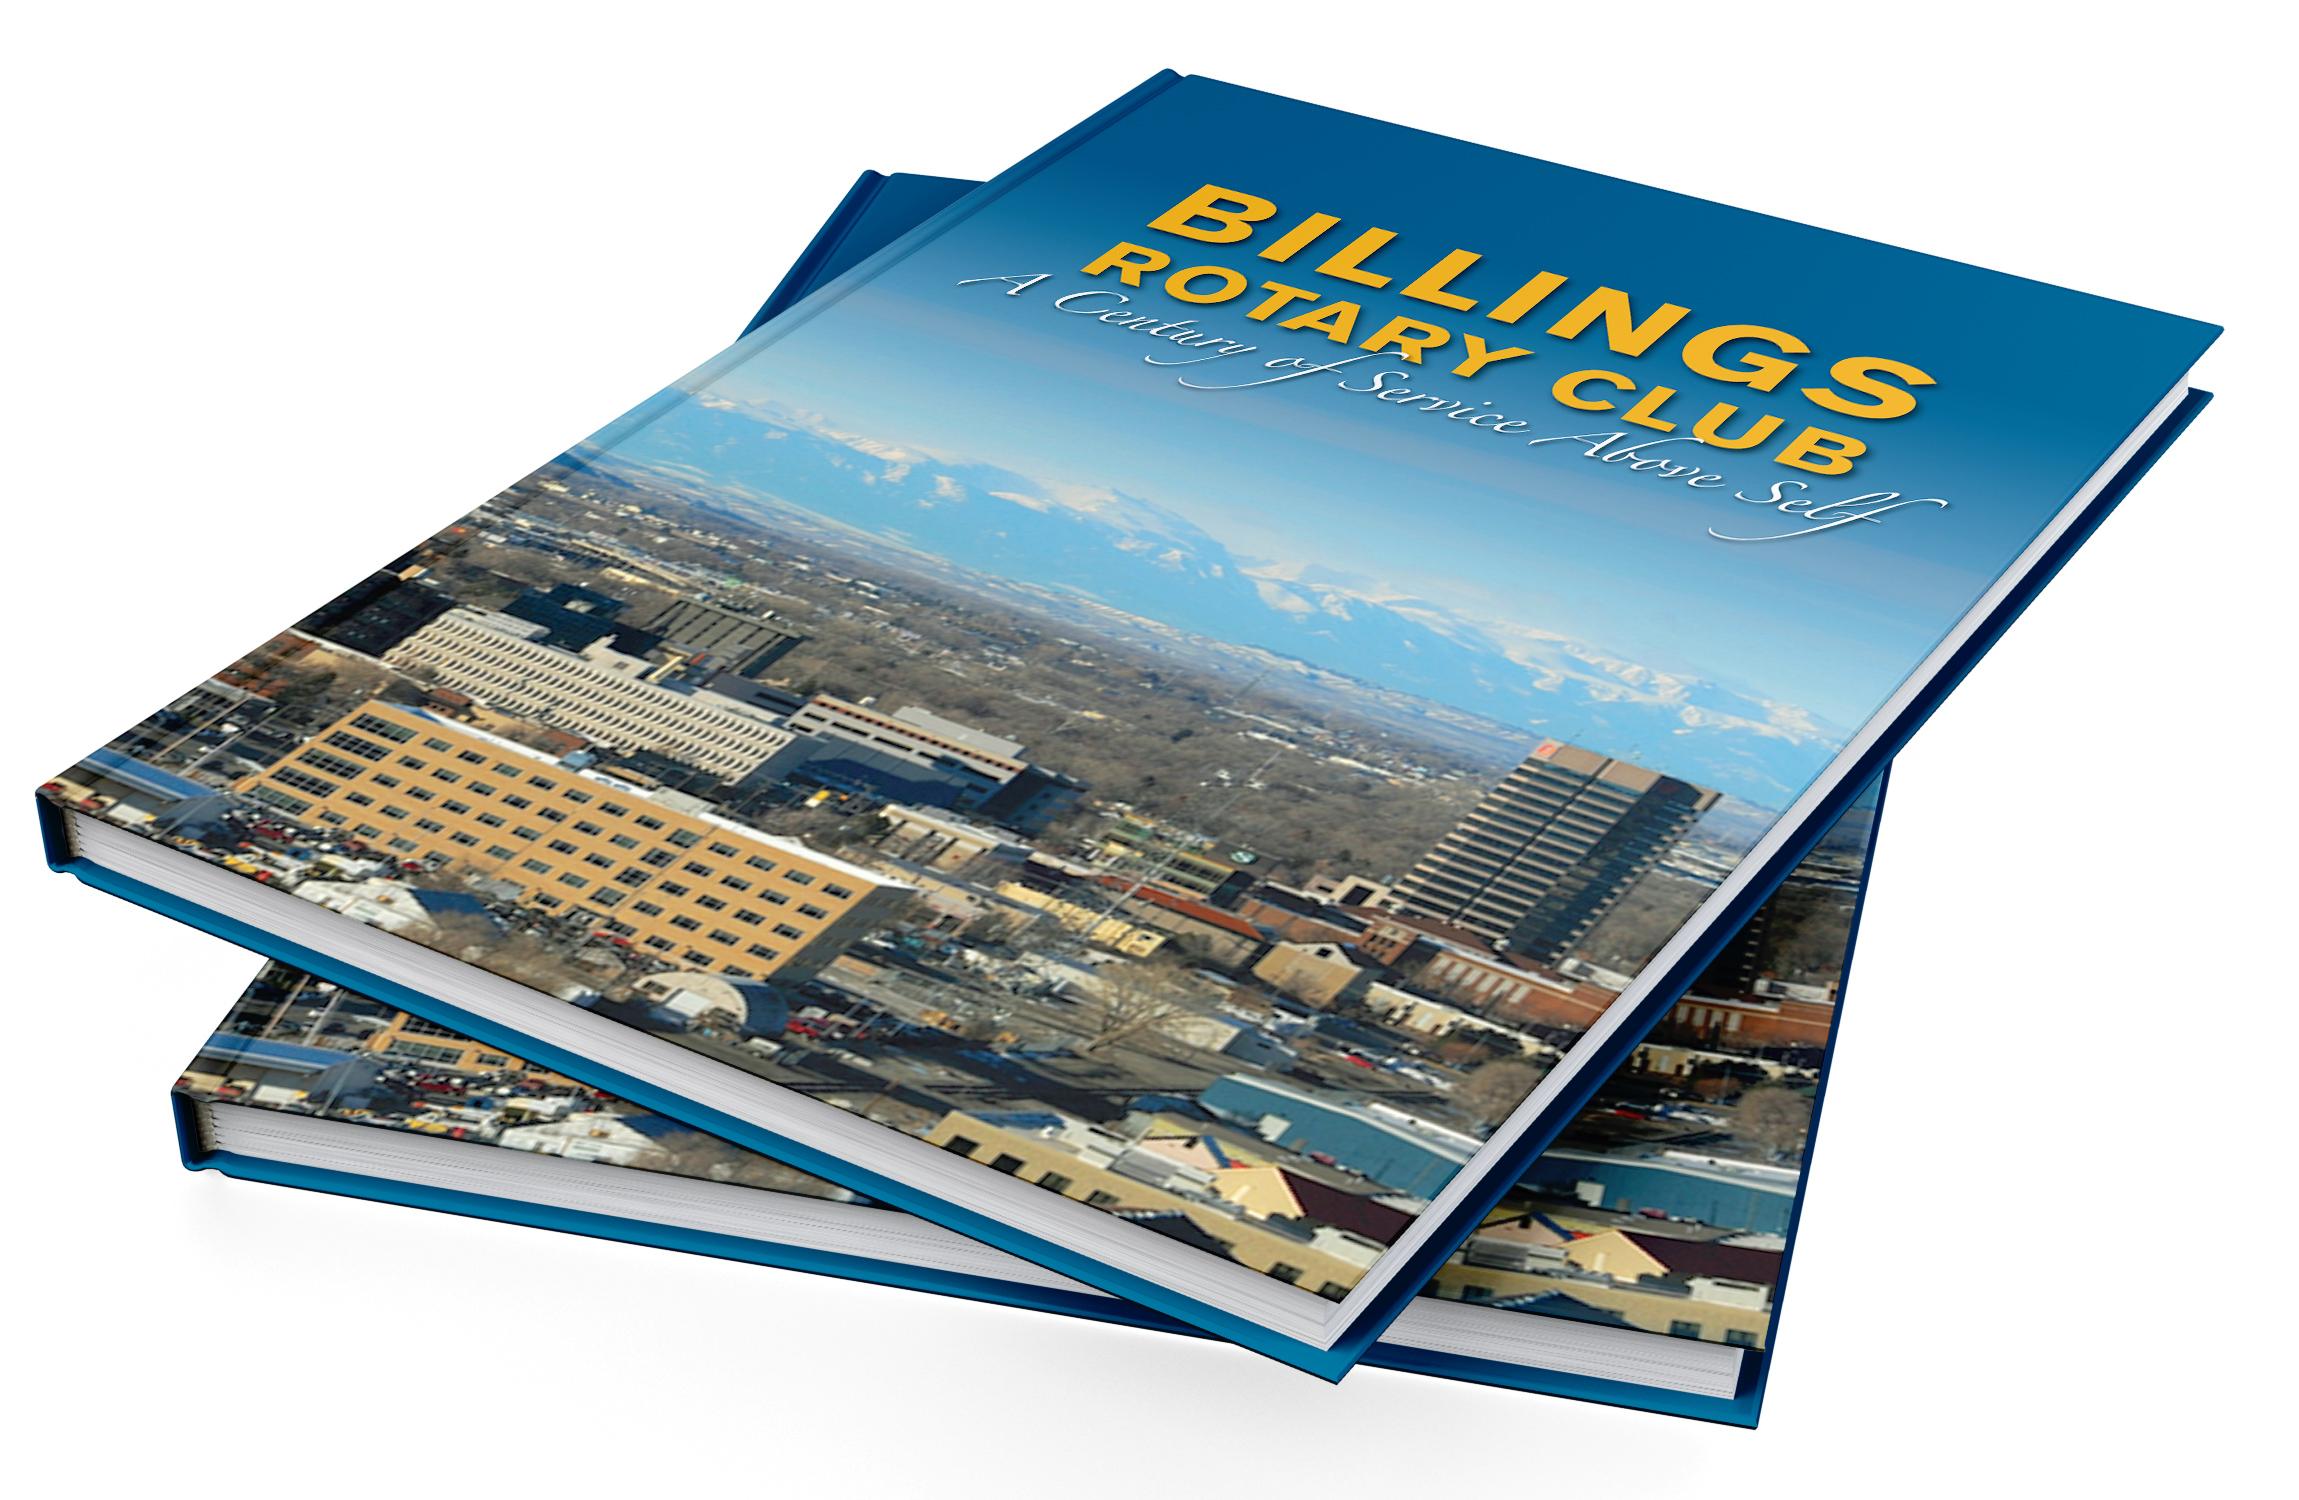 Billings Rotary